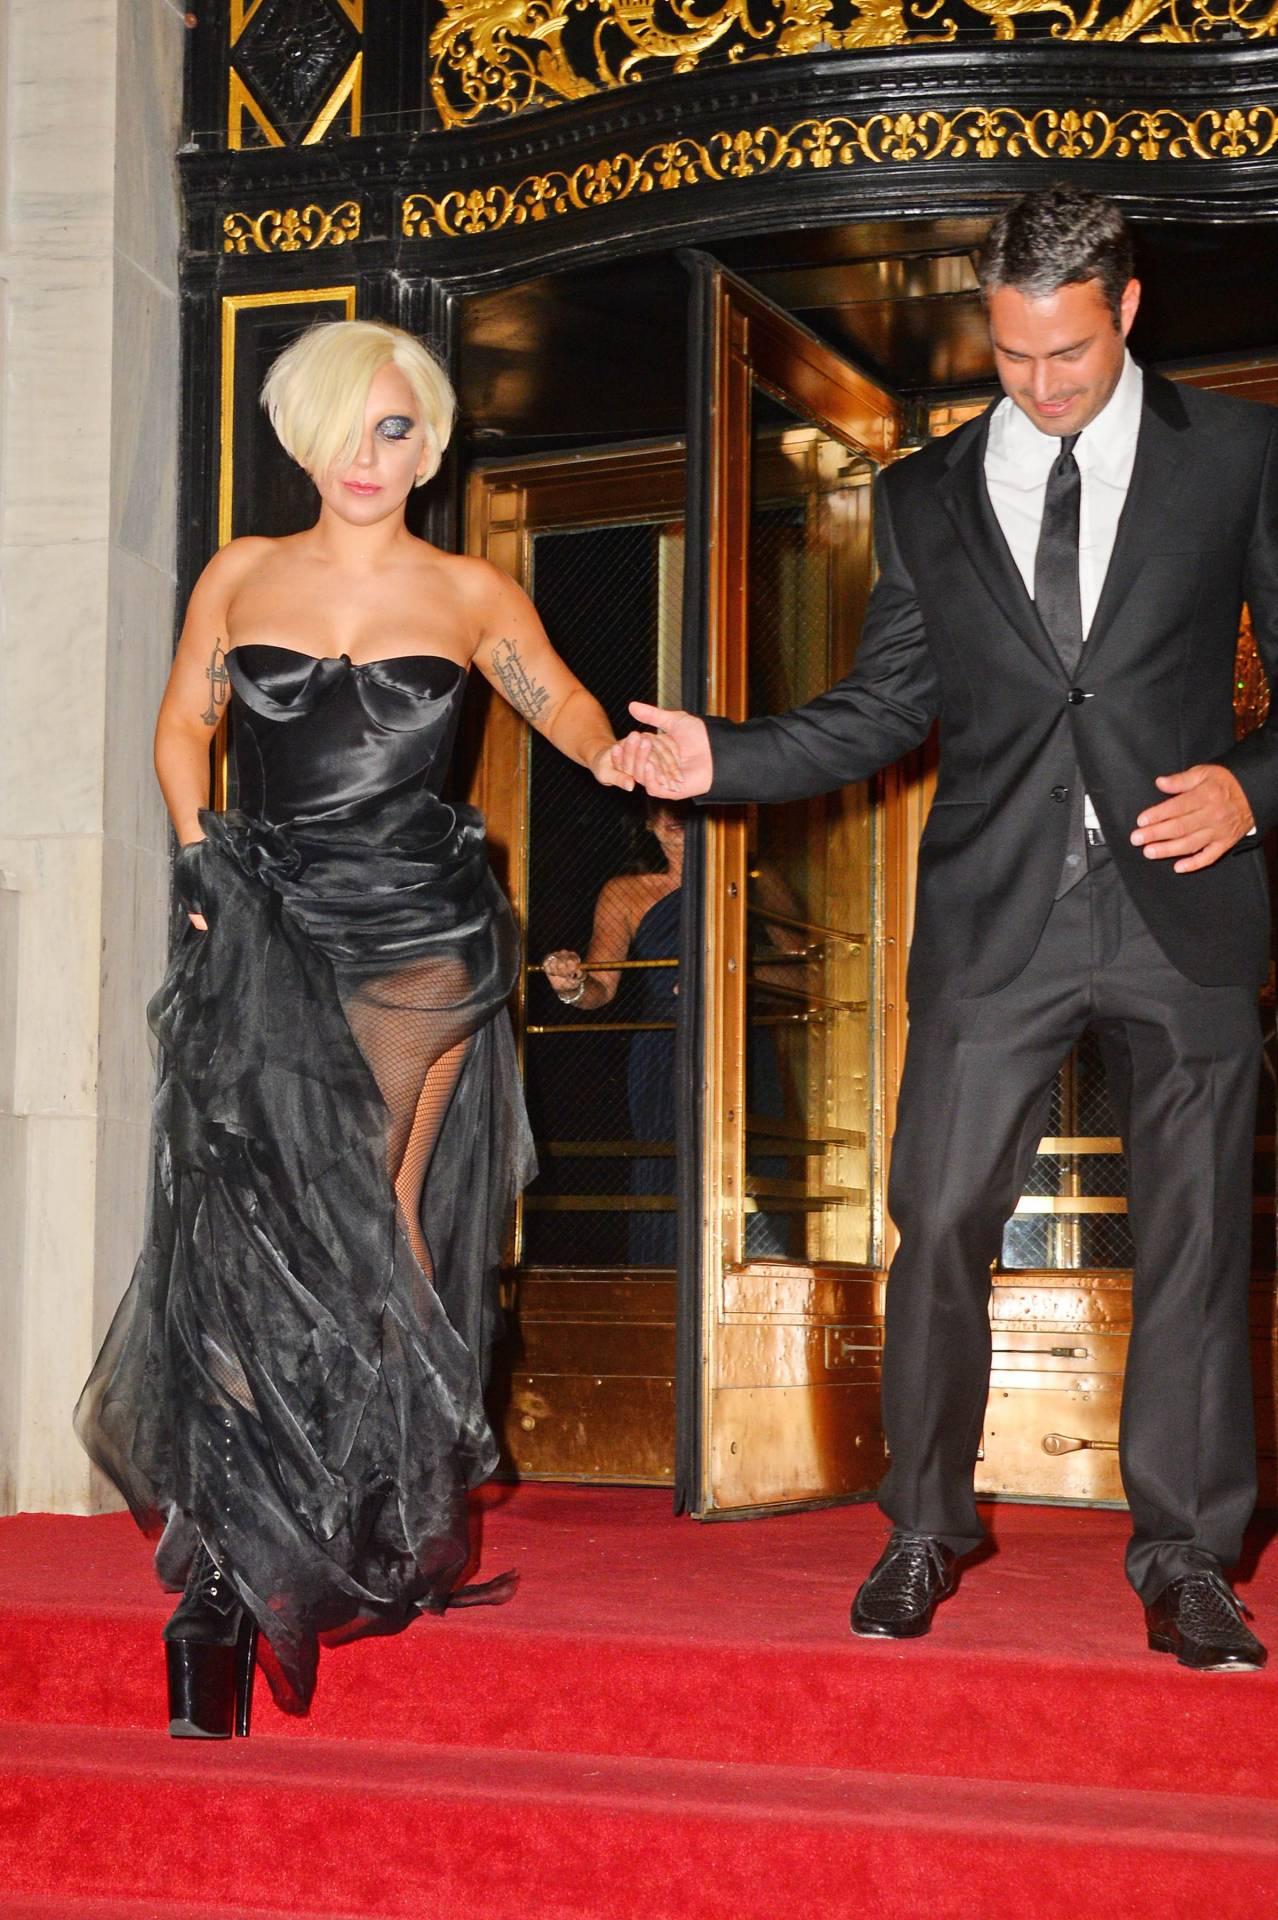 Lady Gaga and Taylor Kinney. - Page 3 Tumblr_nbhzfttufj1rz7rr7o9_1280